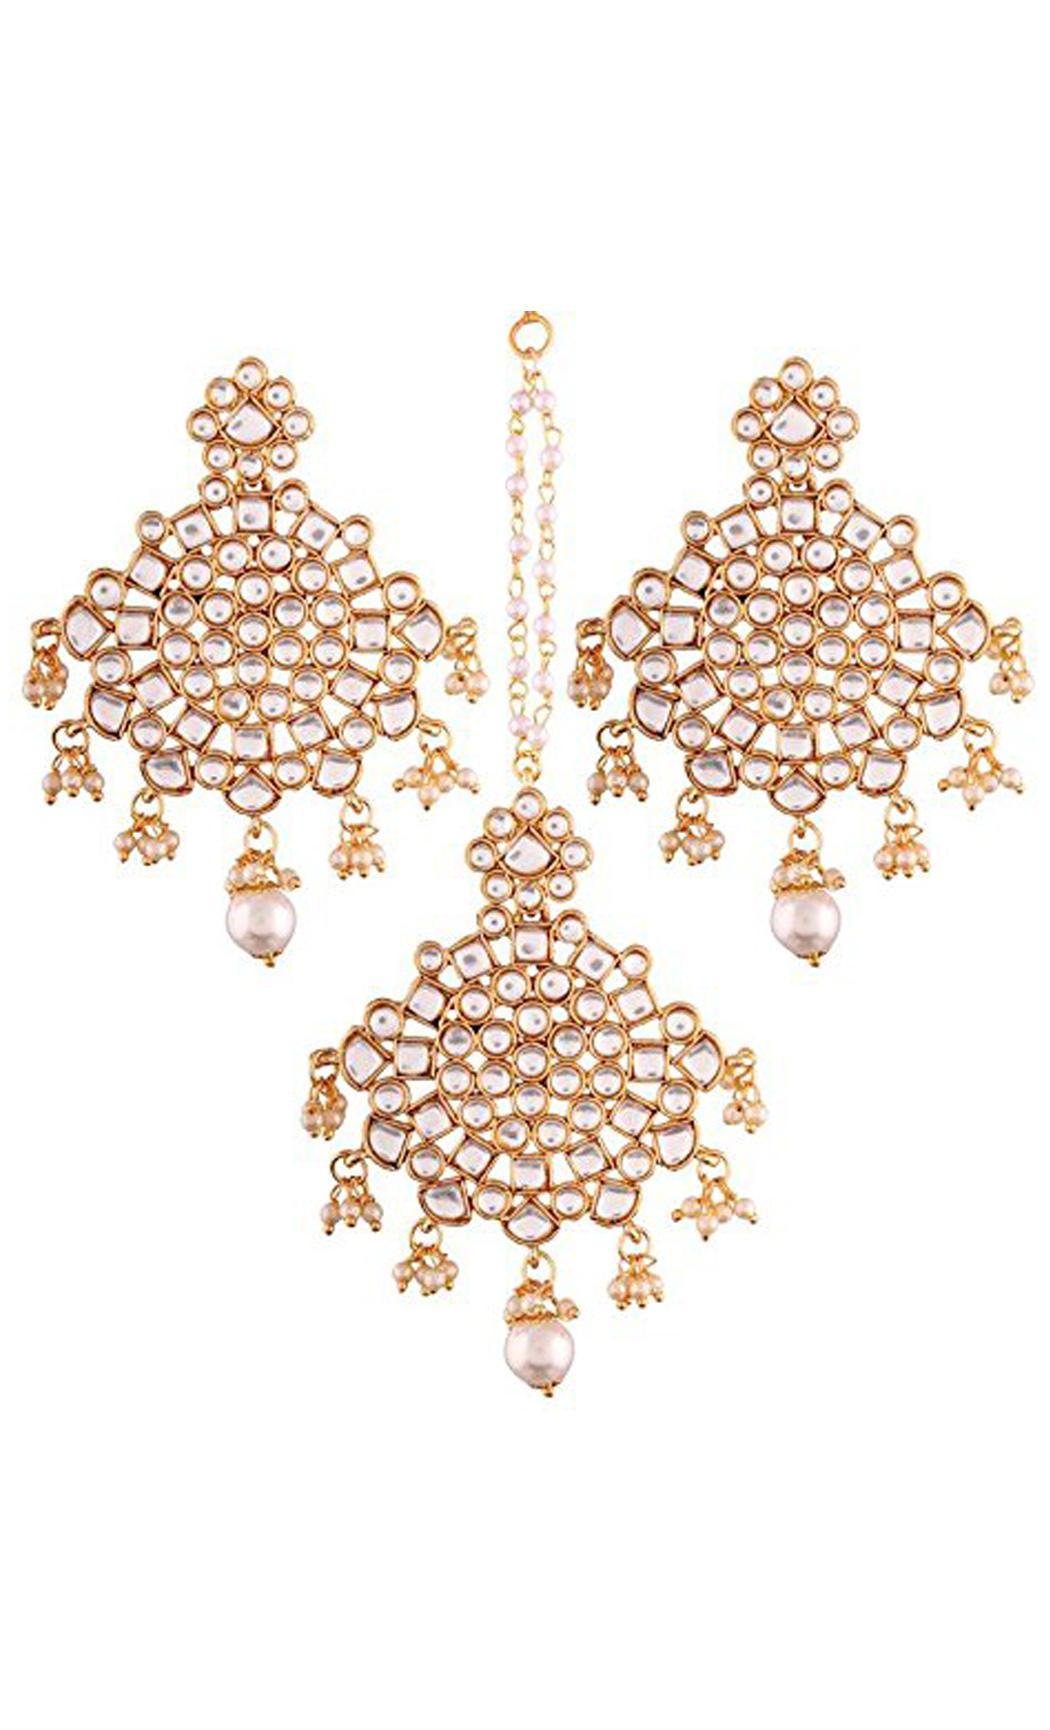 Kundan and Pearl Chaandbali Earrings and Maang Tikka Gold Plated Set | Indian Bridal Jewellery Collection